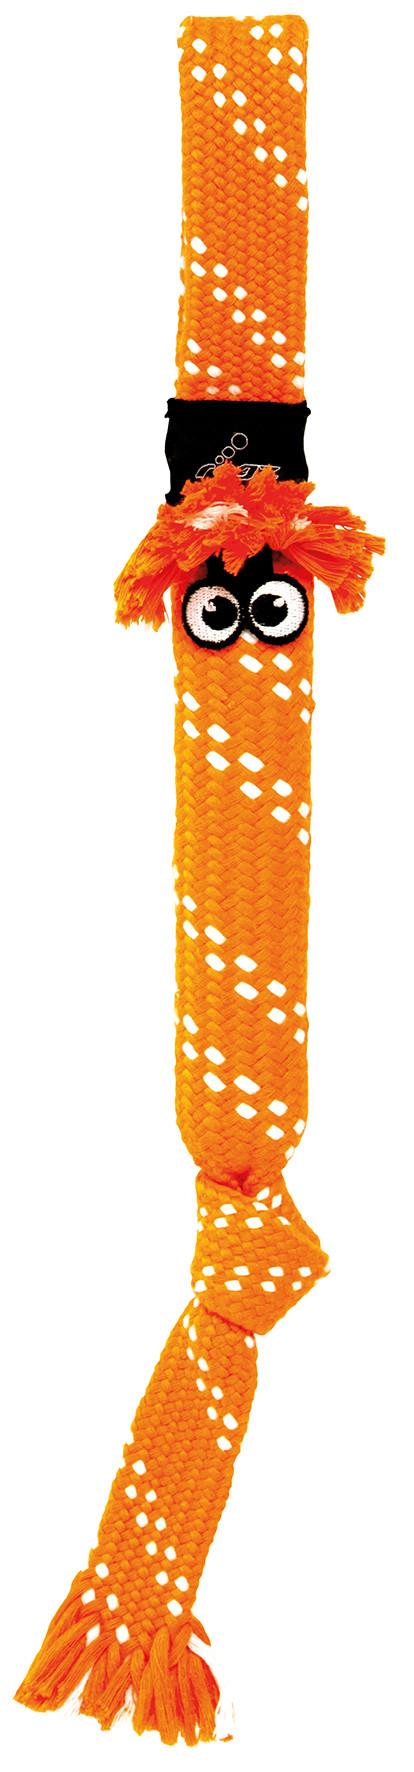 Rogz Scrubz orange